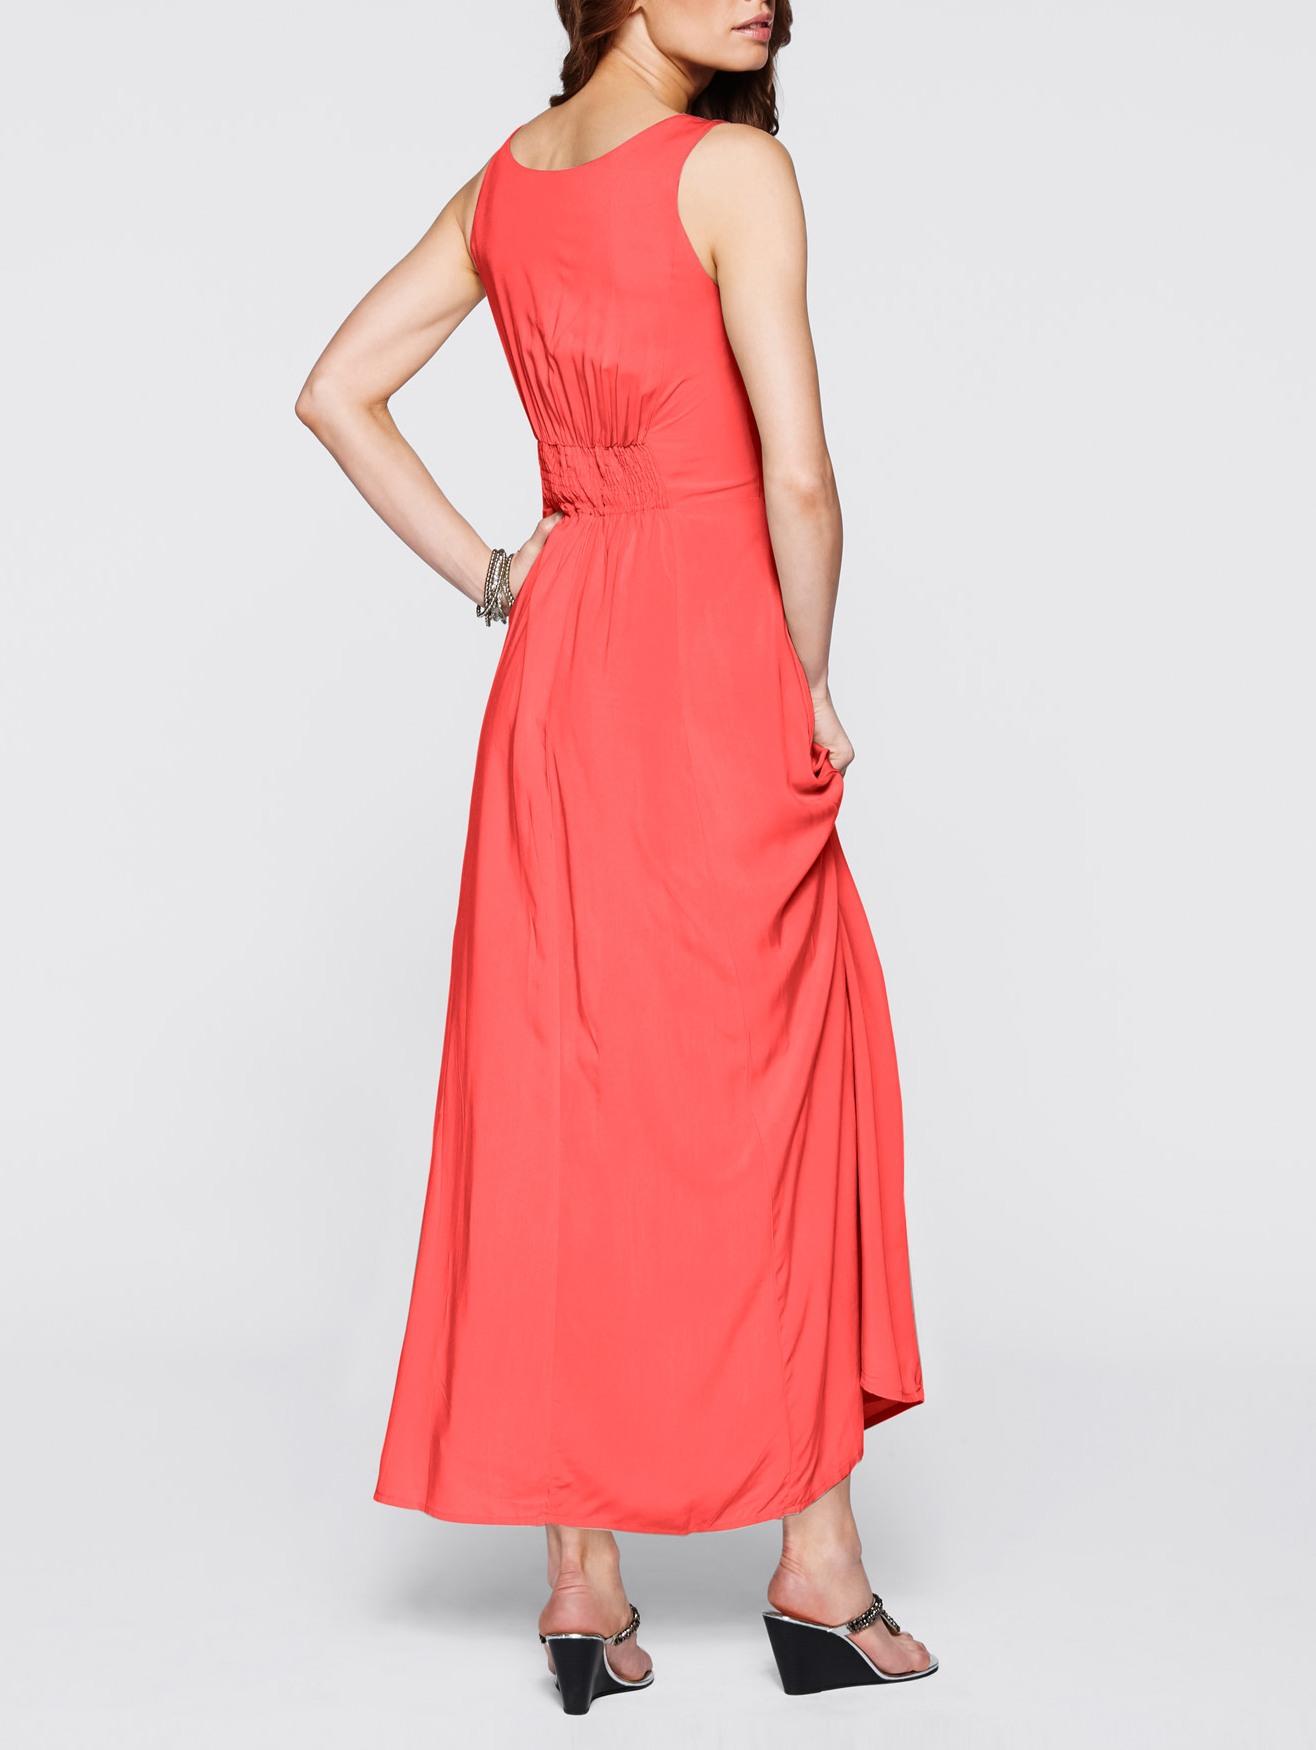 Kleid mit Stickerei Gr. 42 Koralle Maxikleid Abendkleid ...